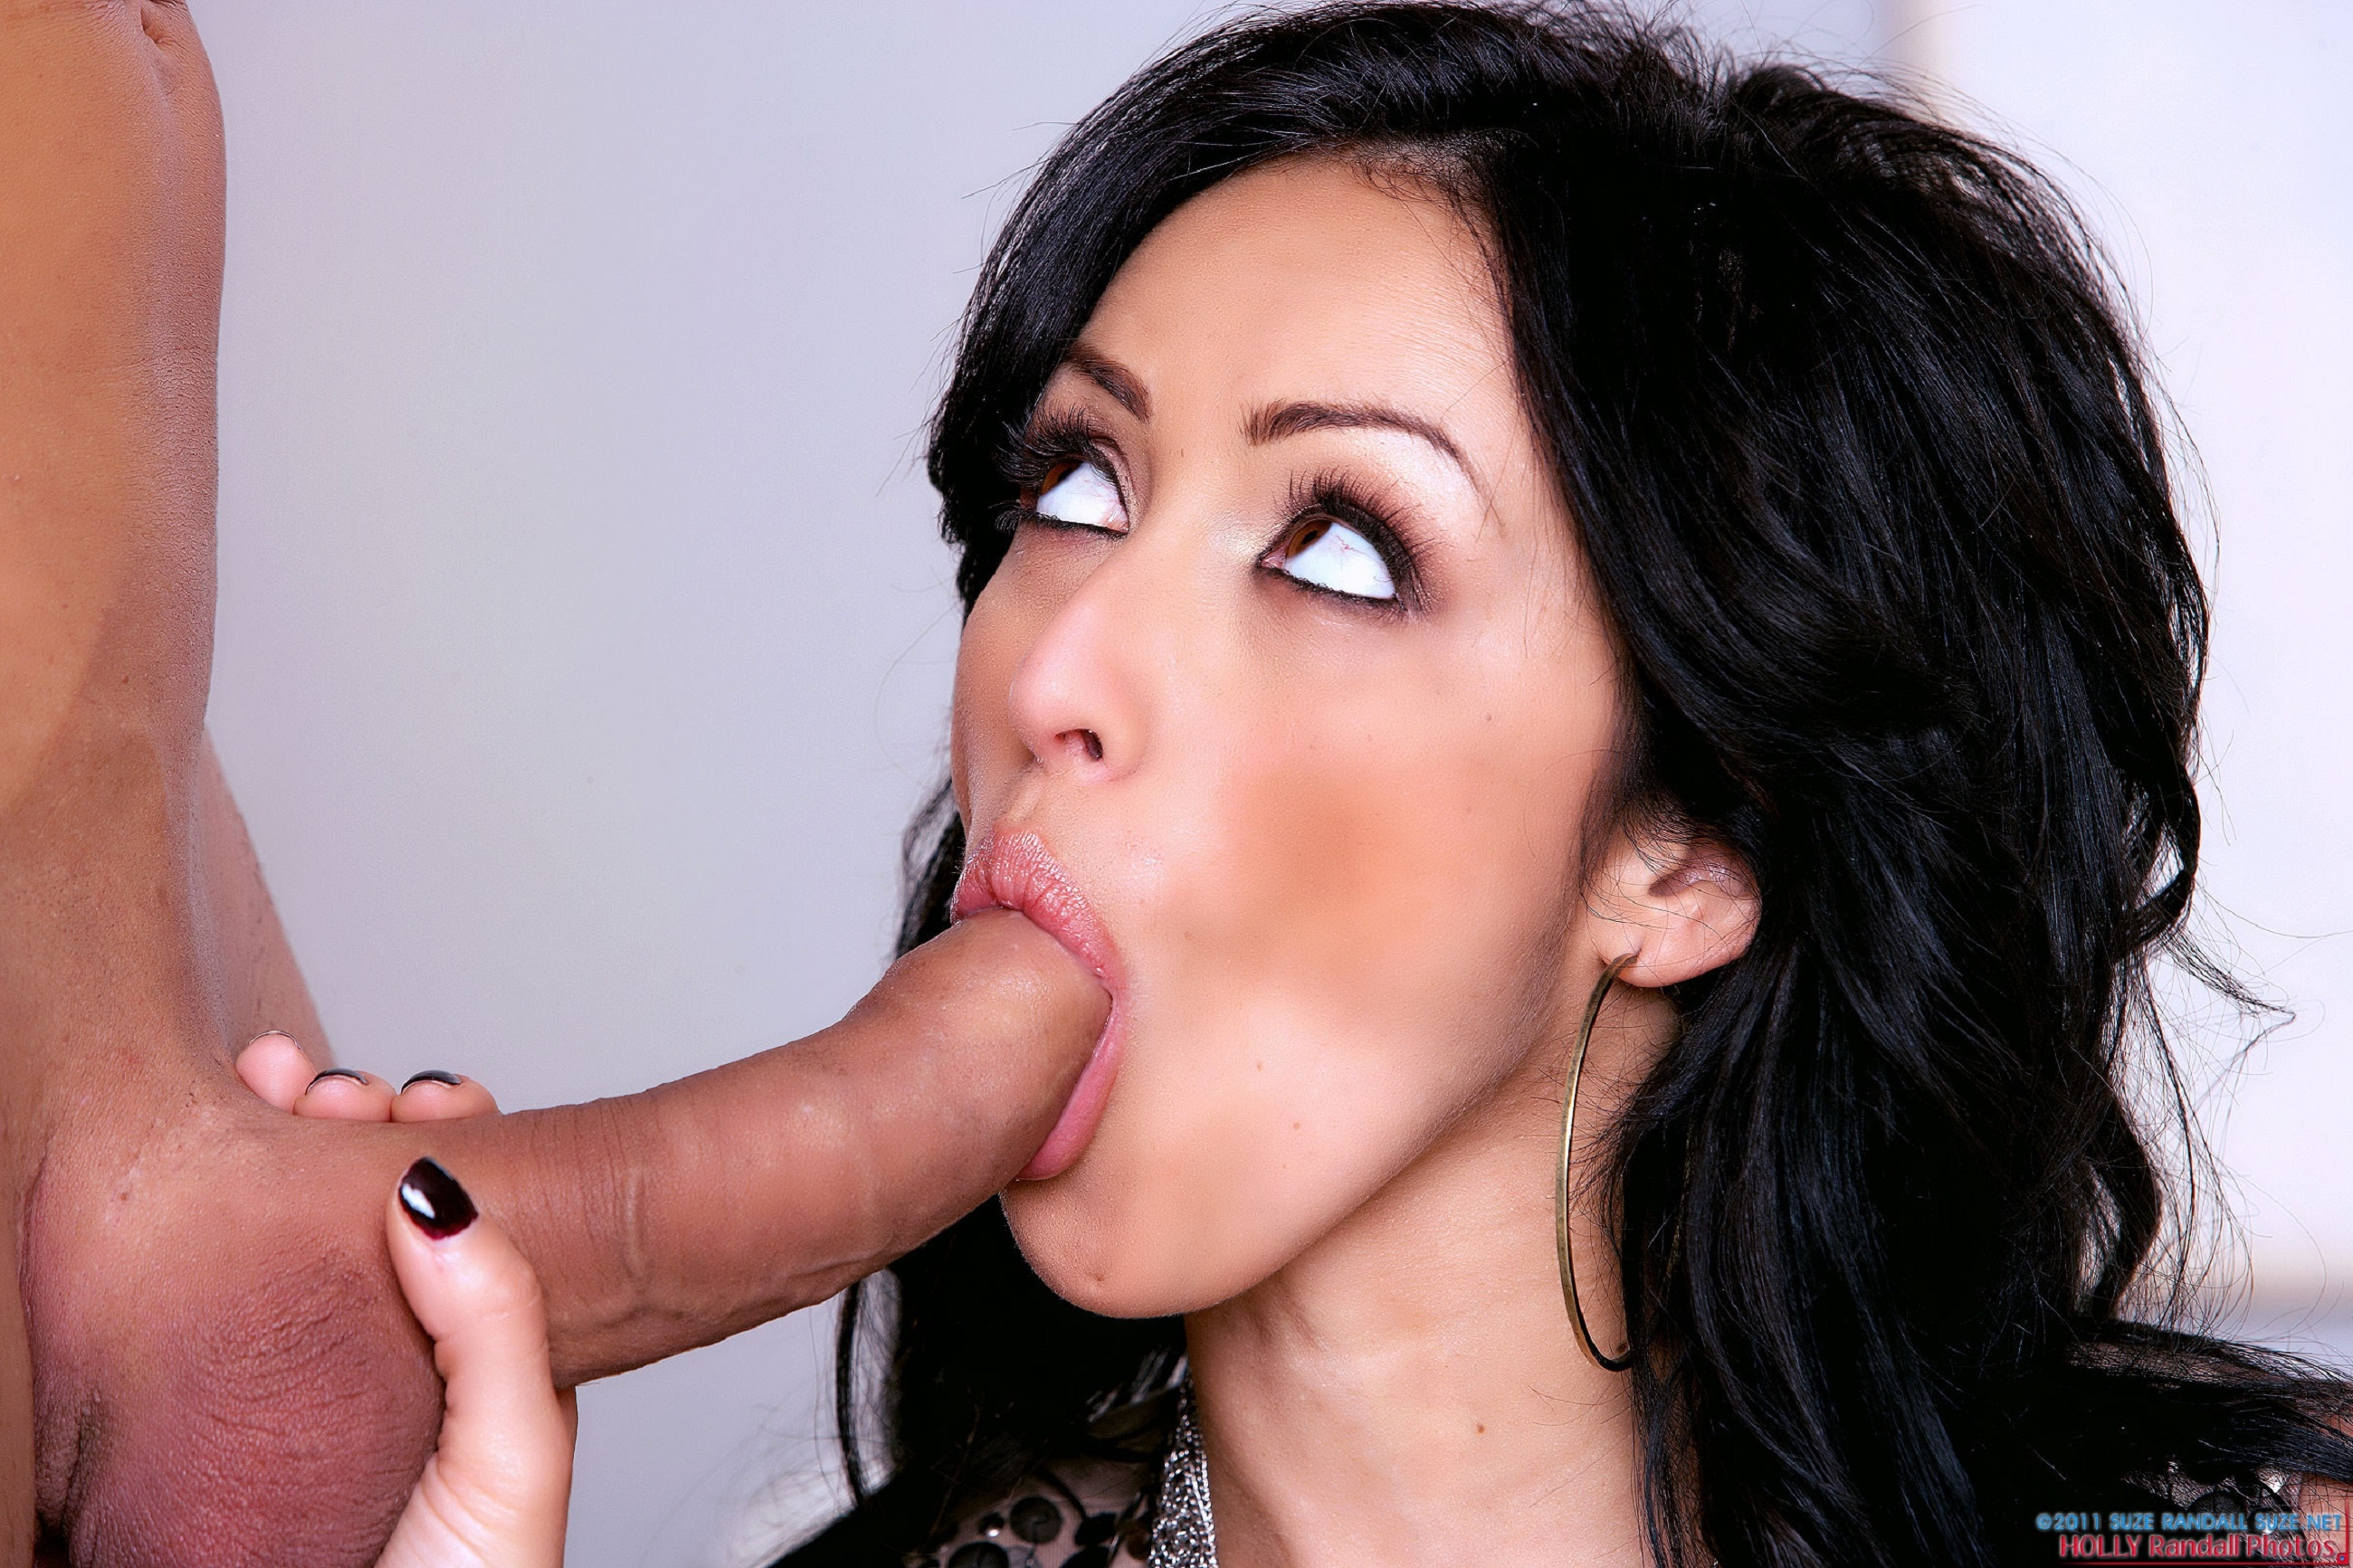 porn-star-ramon-nomar-byance-putting-on-pantyhose